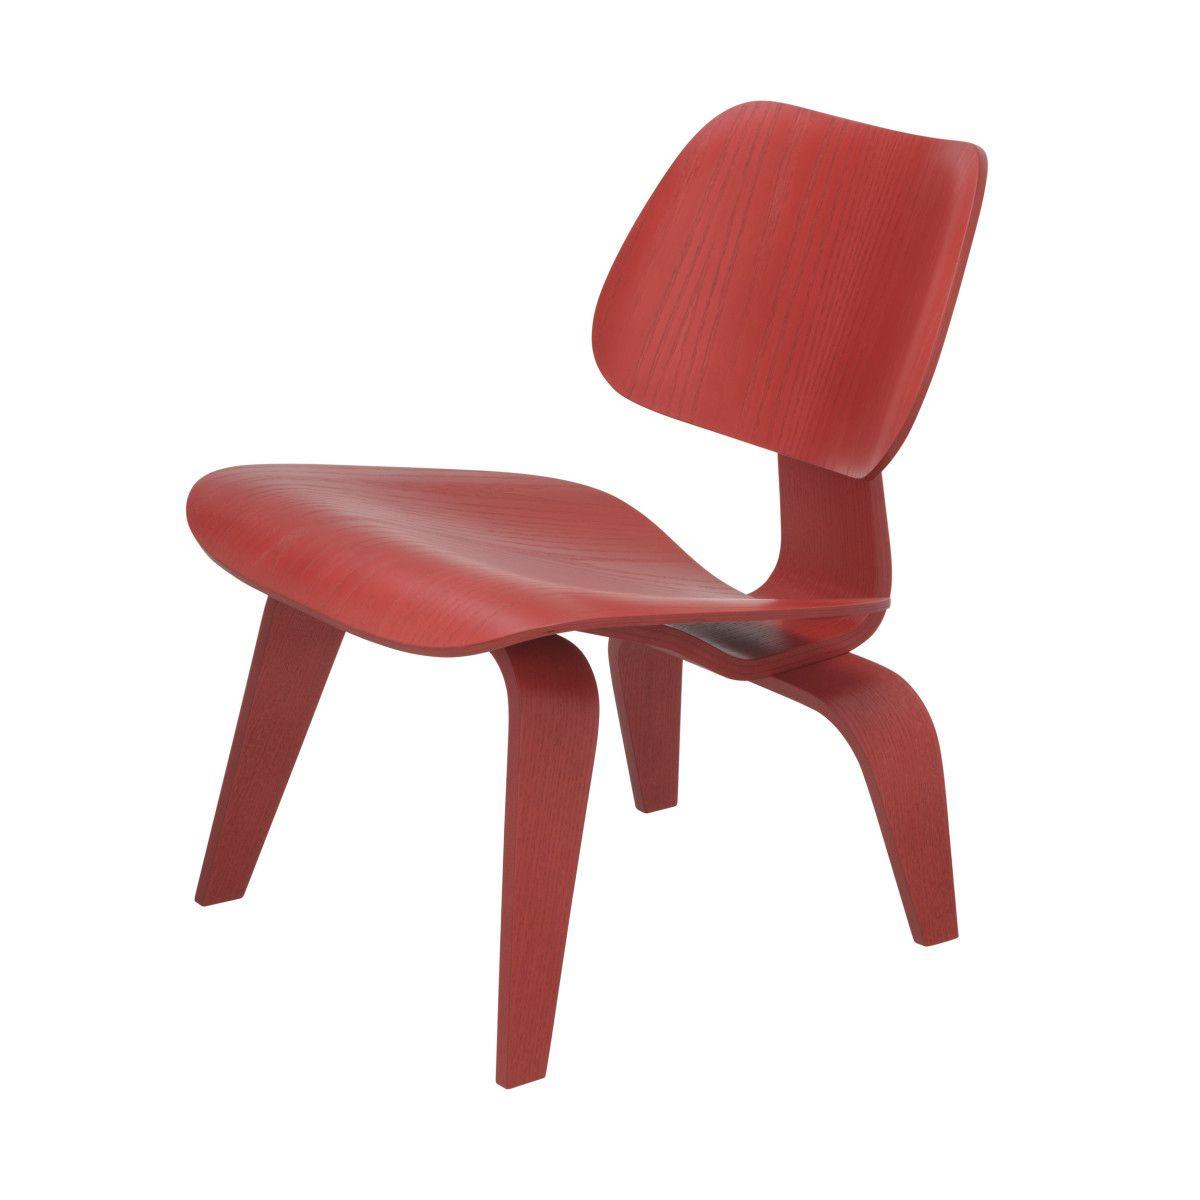 plywood group lcw sessel jetzt bestellen unter - Planner Sessel